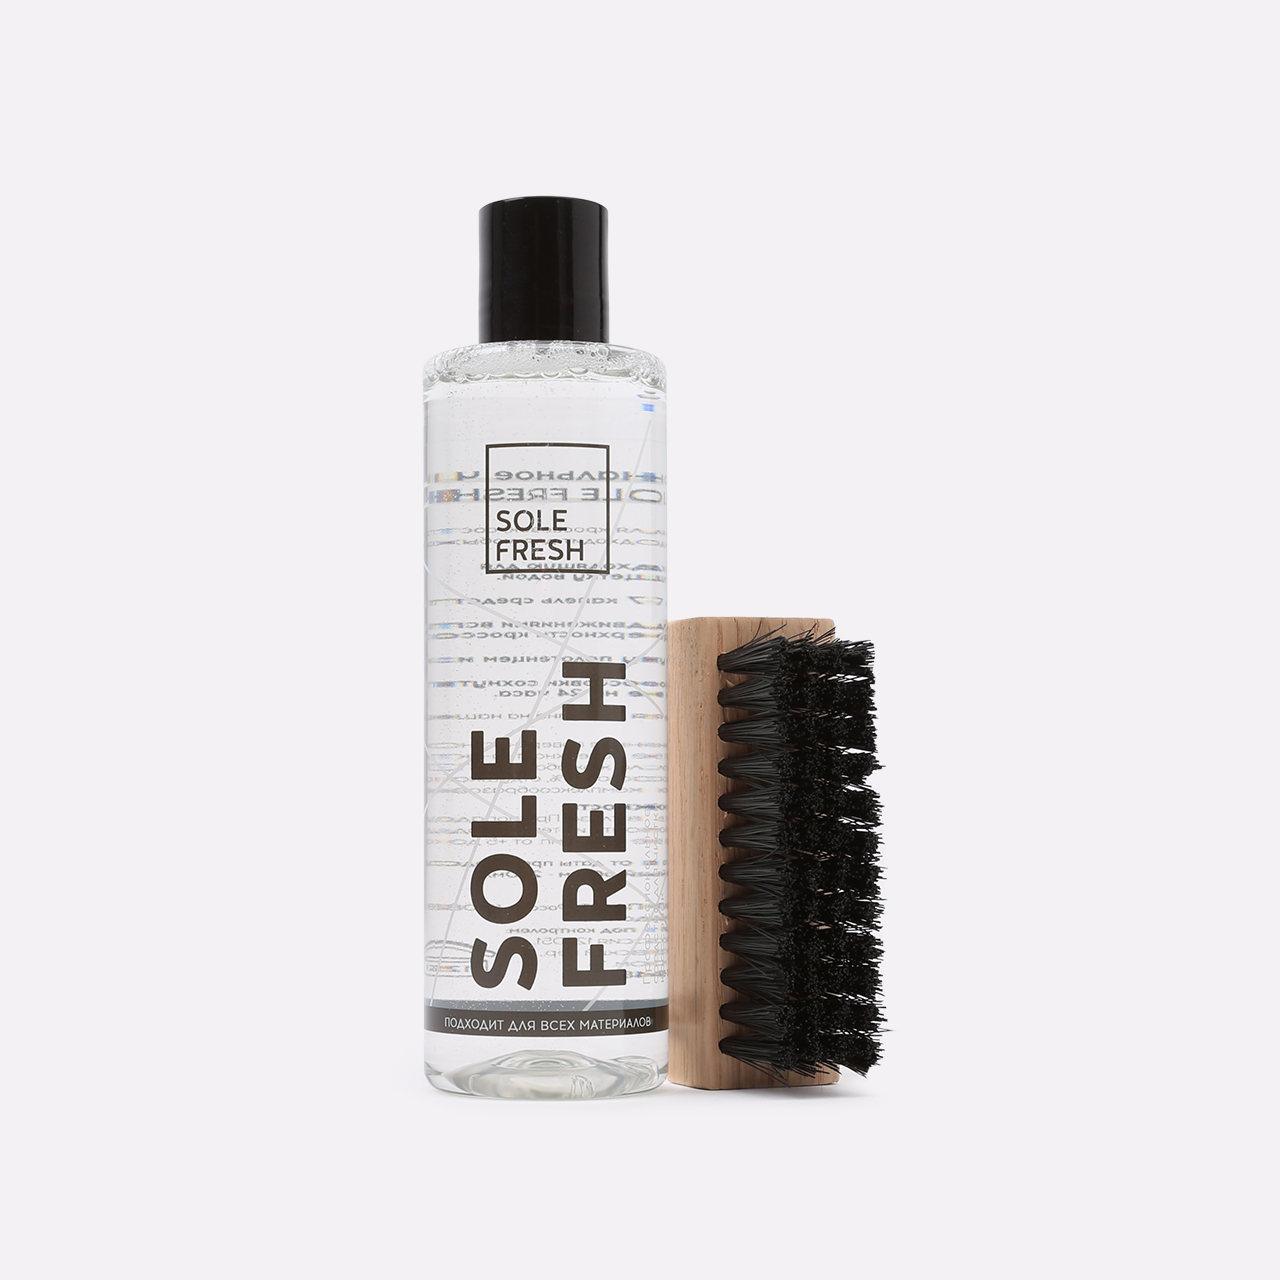 Чистящее средство Sole Fresh Basic фото